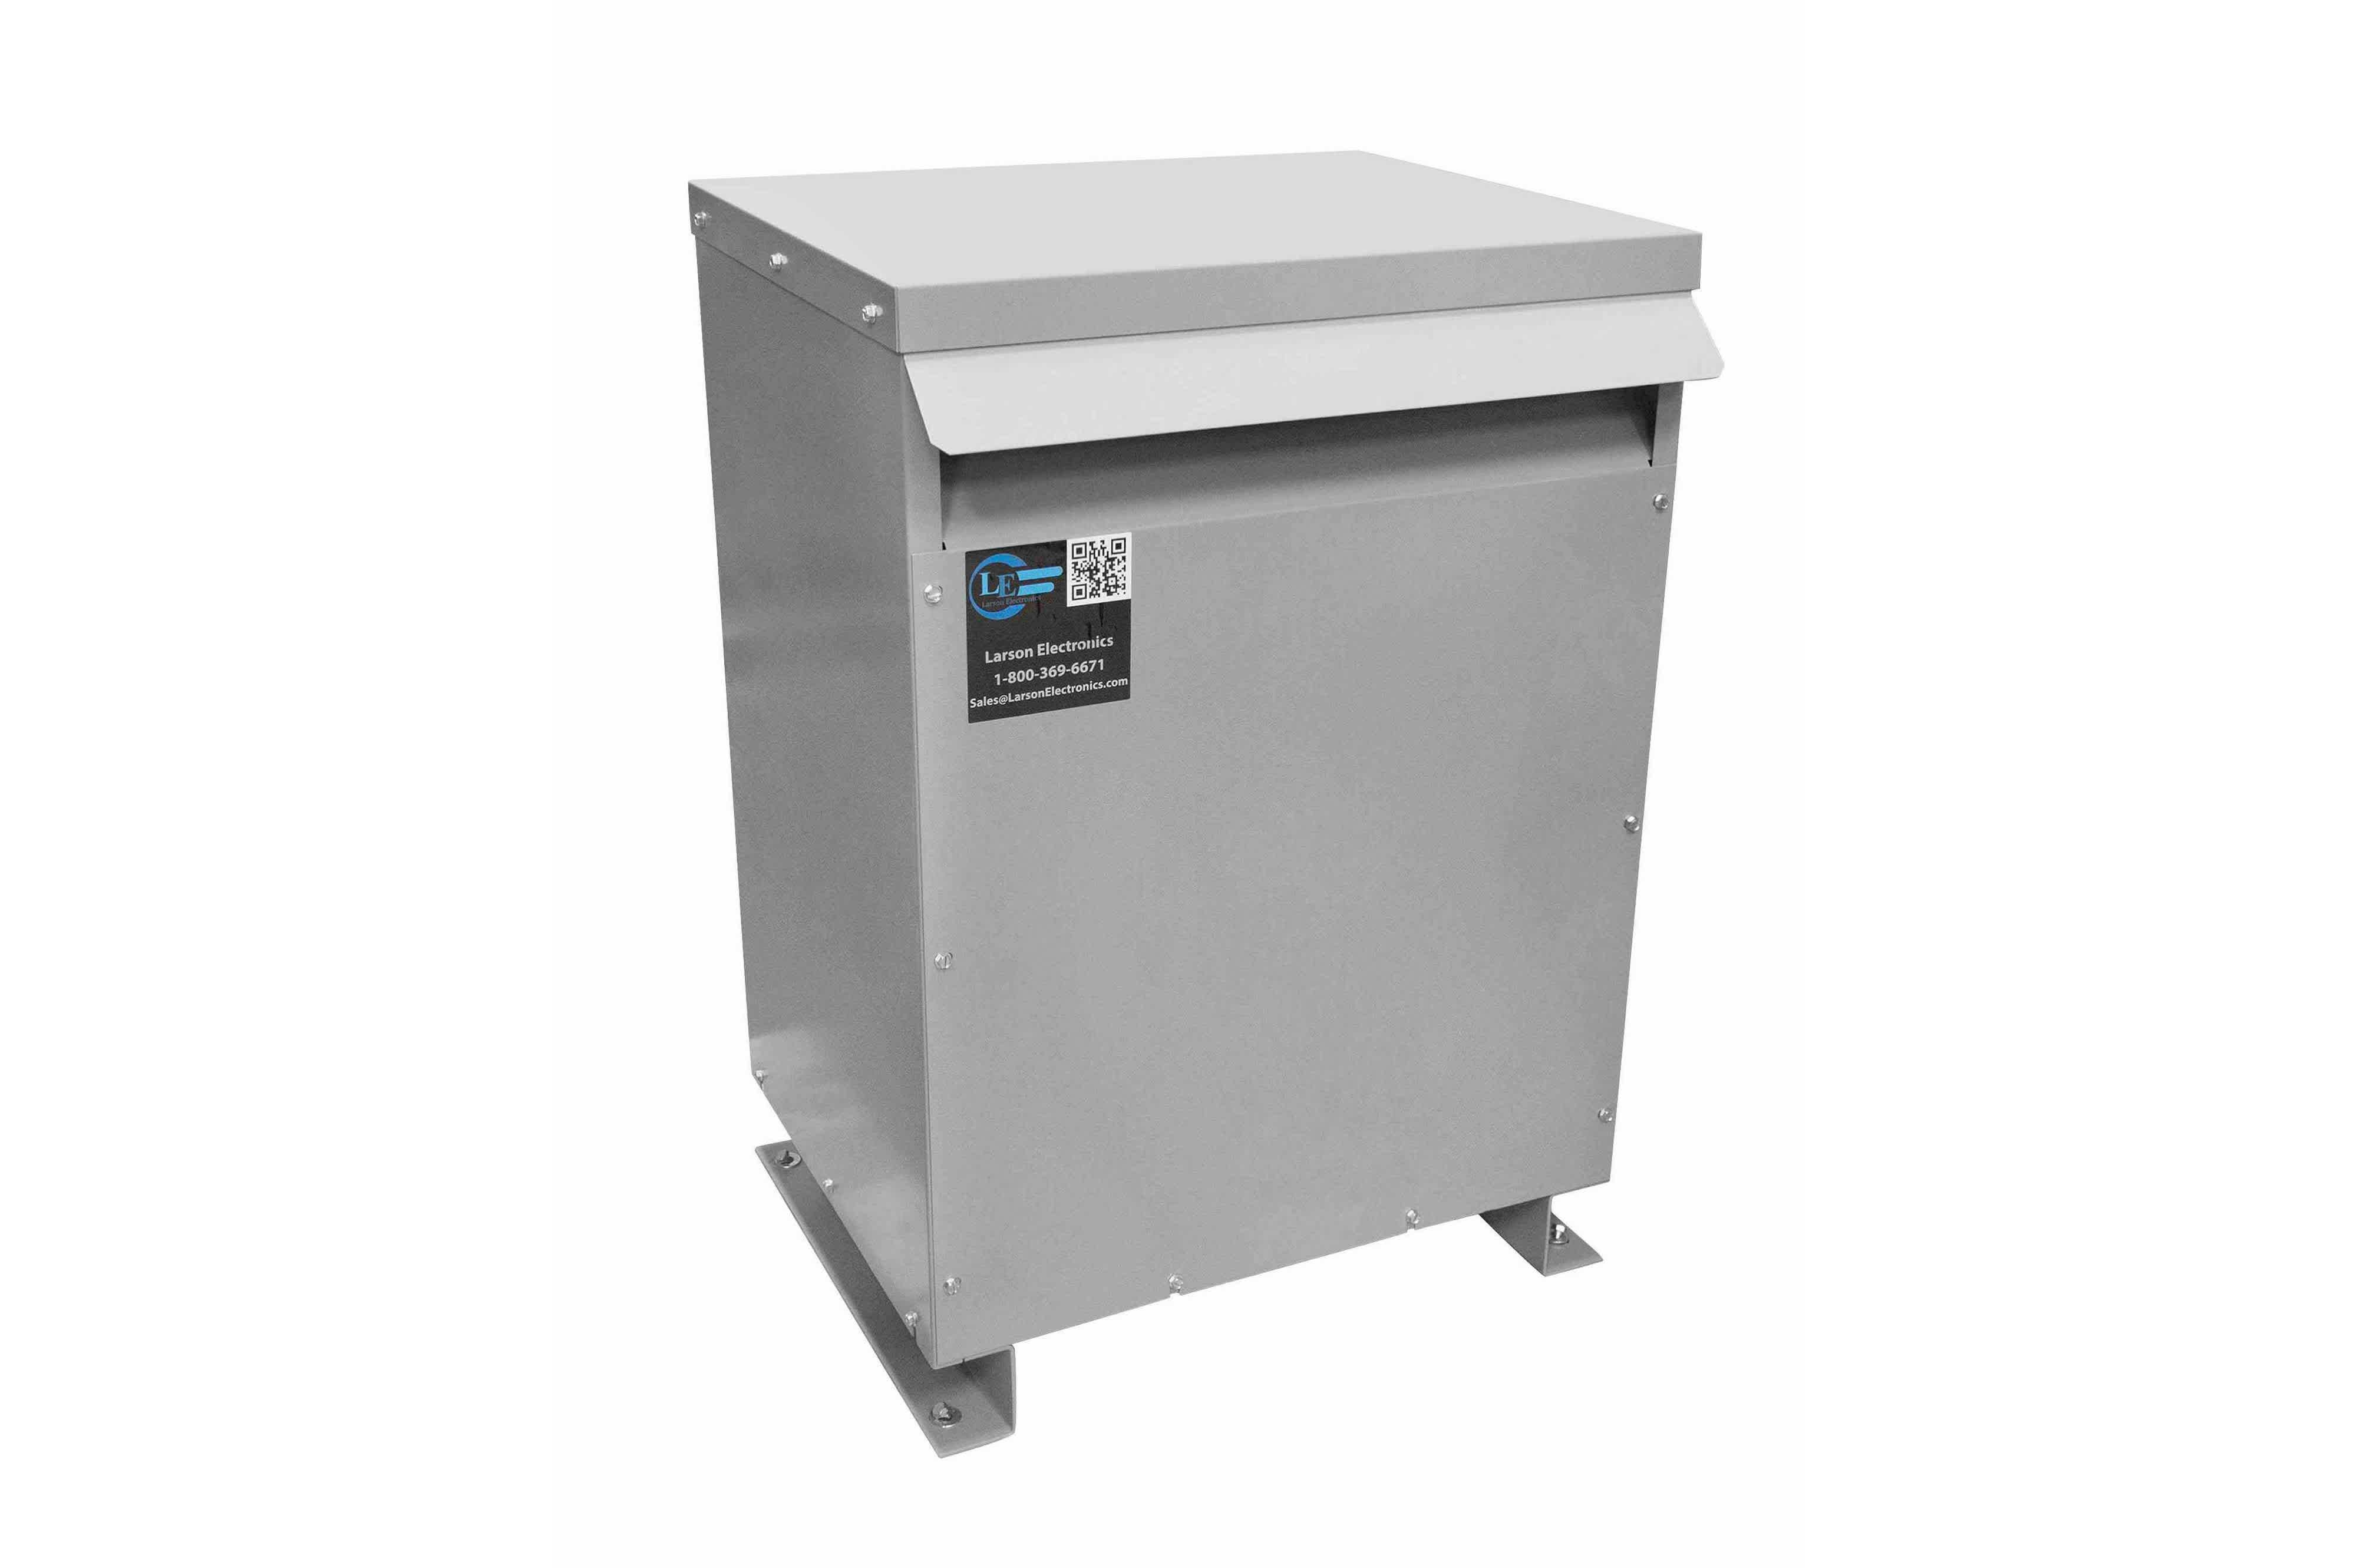 175 kVA 3PH Isolation Transformer, 480V Wye Primary, 400Y/231 Wye-N Secondary, N3R, Ventilated, 60 Hz